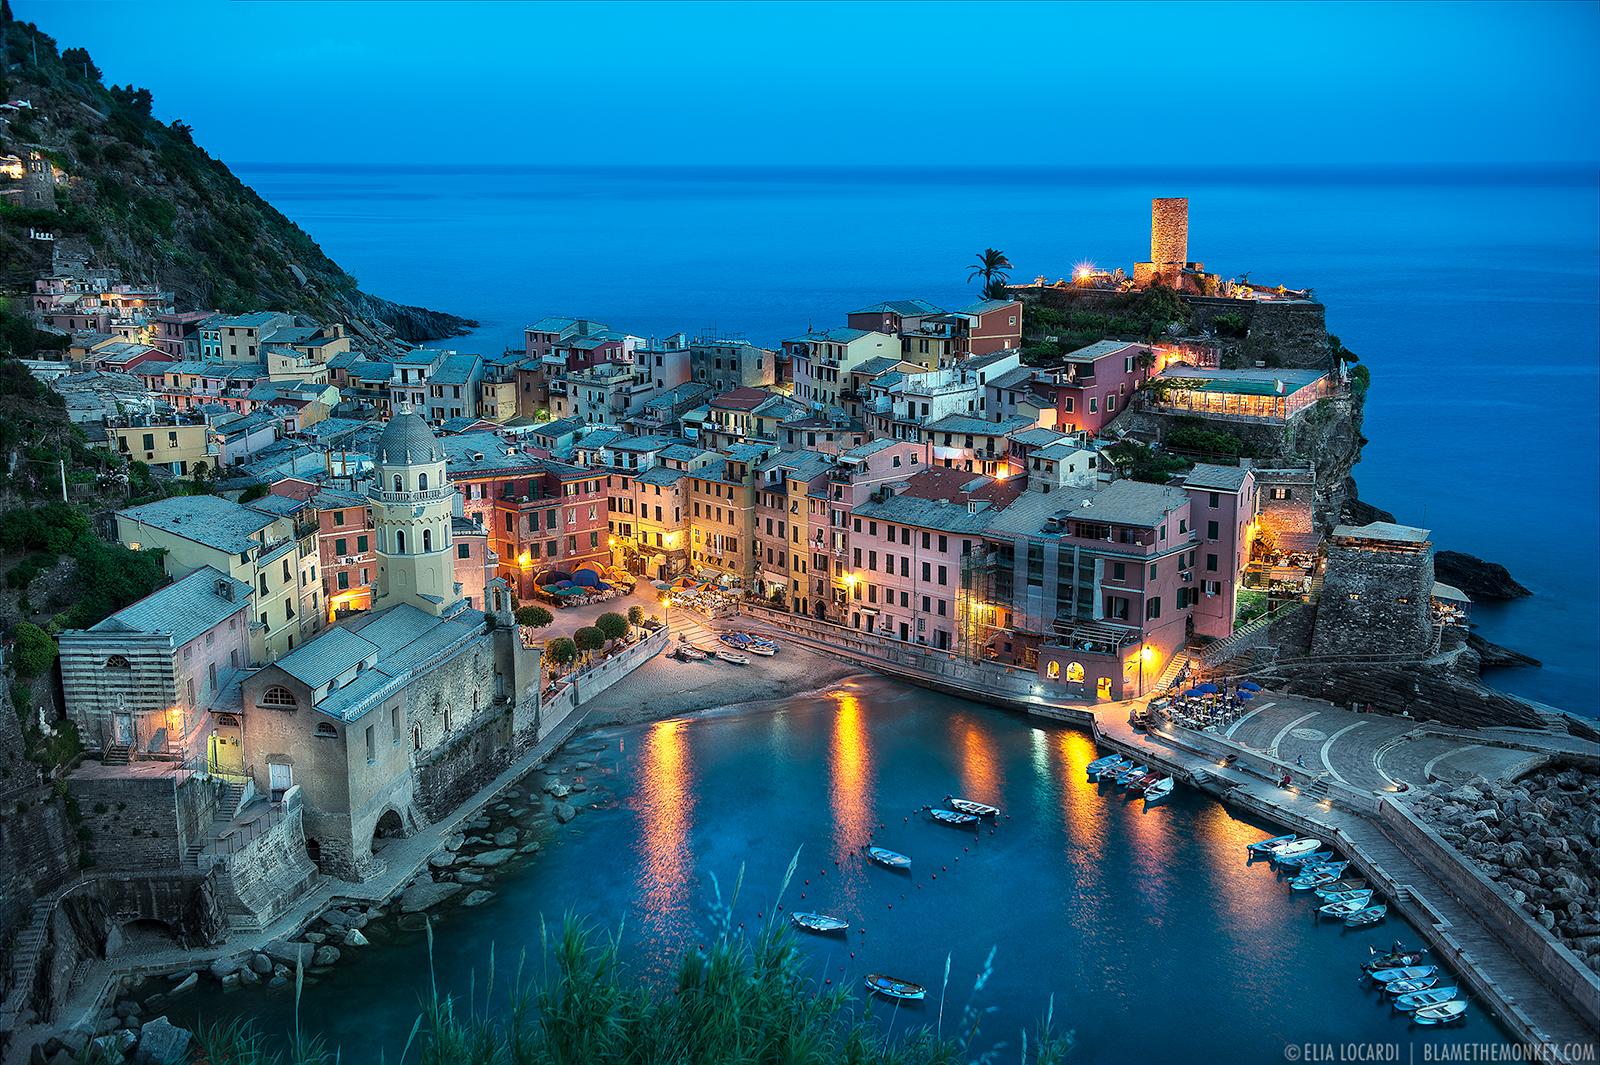 Elia-Locardi-The-Beautiful-Vernazza-(Edited-for-ReShare)-1600-WM.jpg